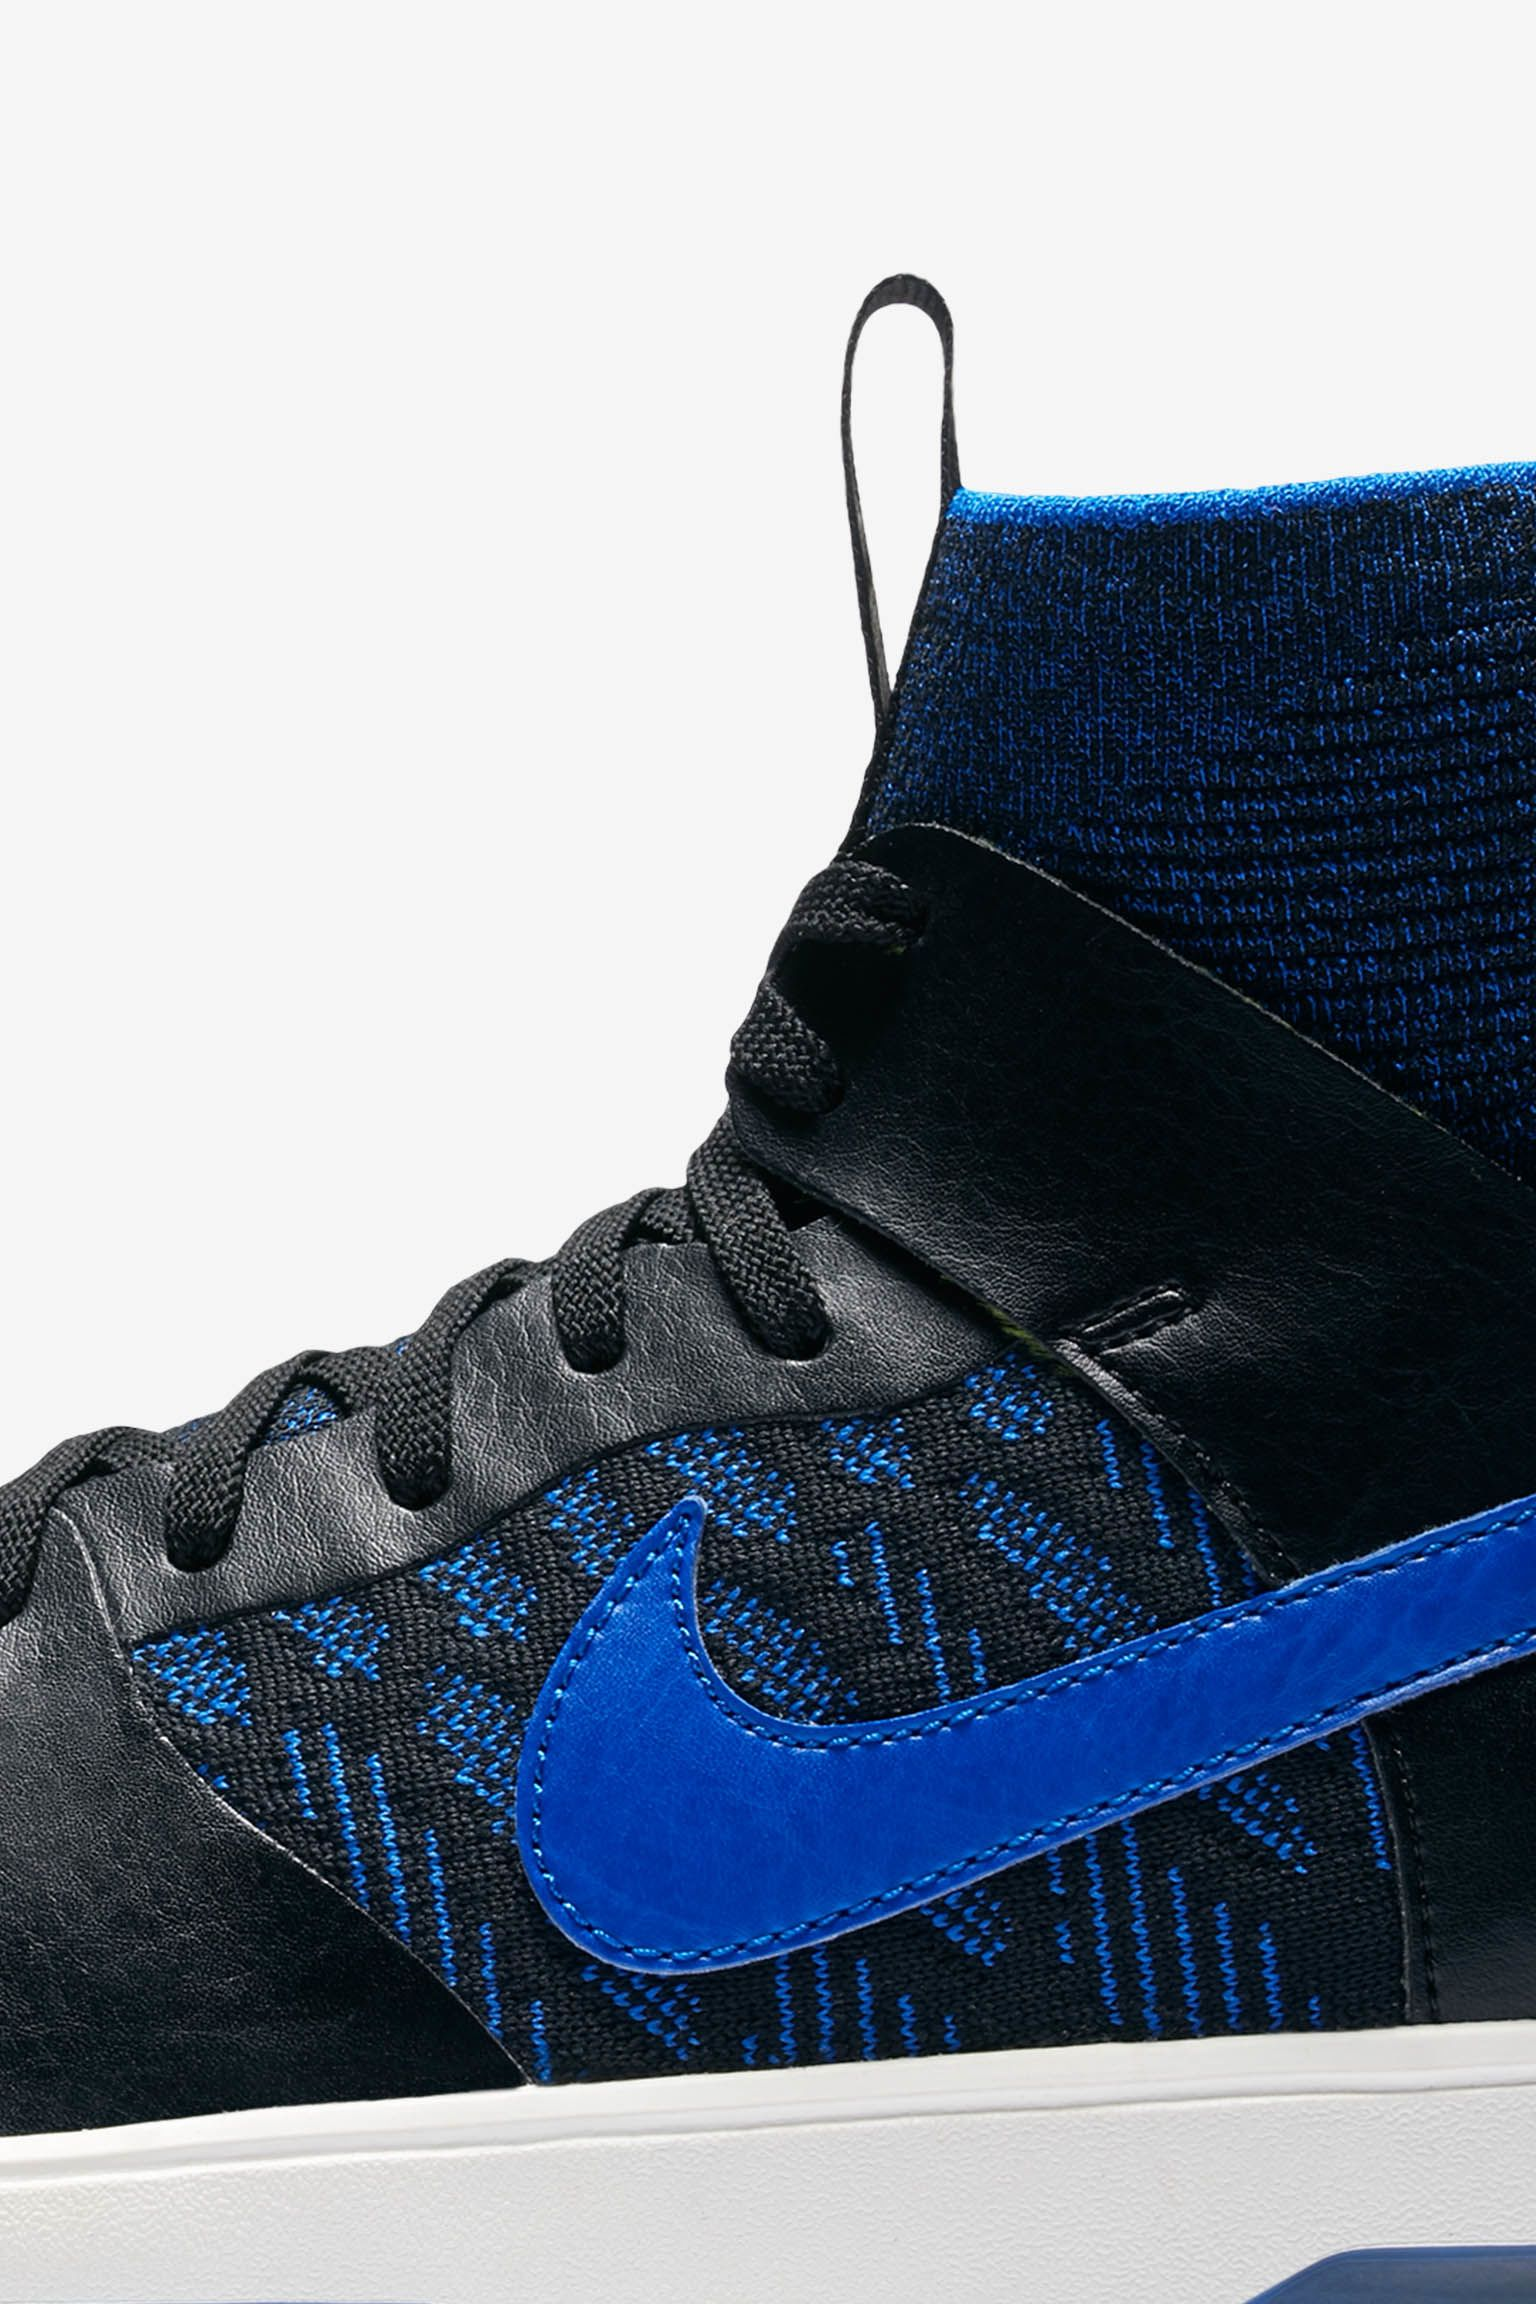 Nike SB Dunk High Elite QS 'Black & Racer Blue' Release Date.